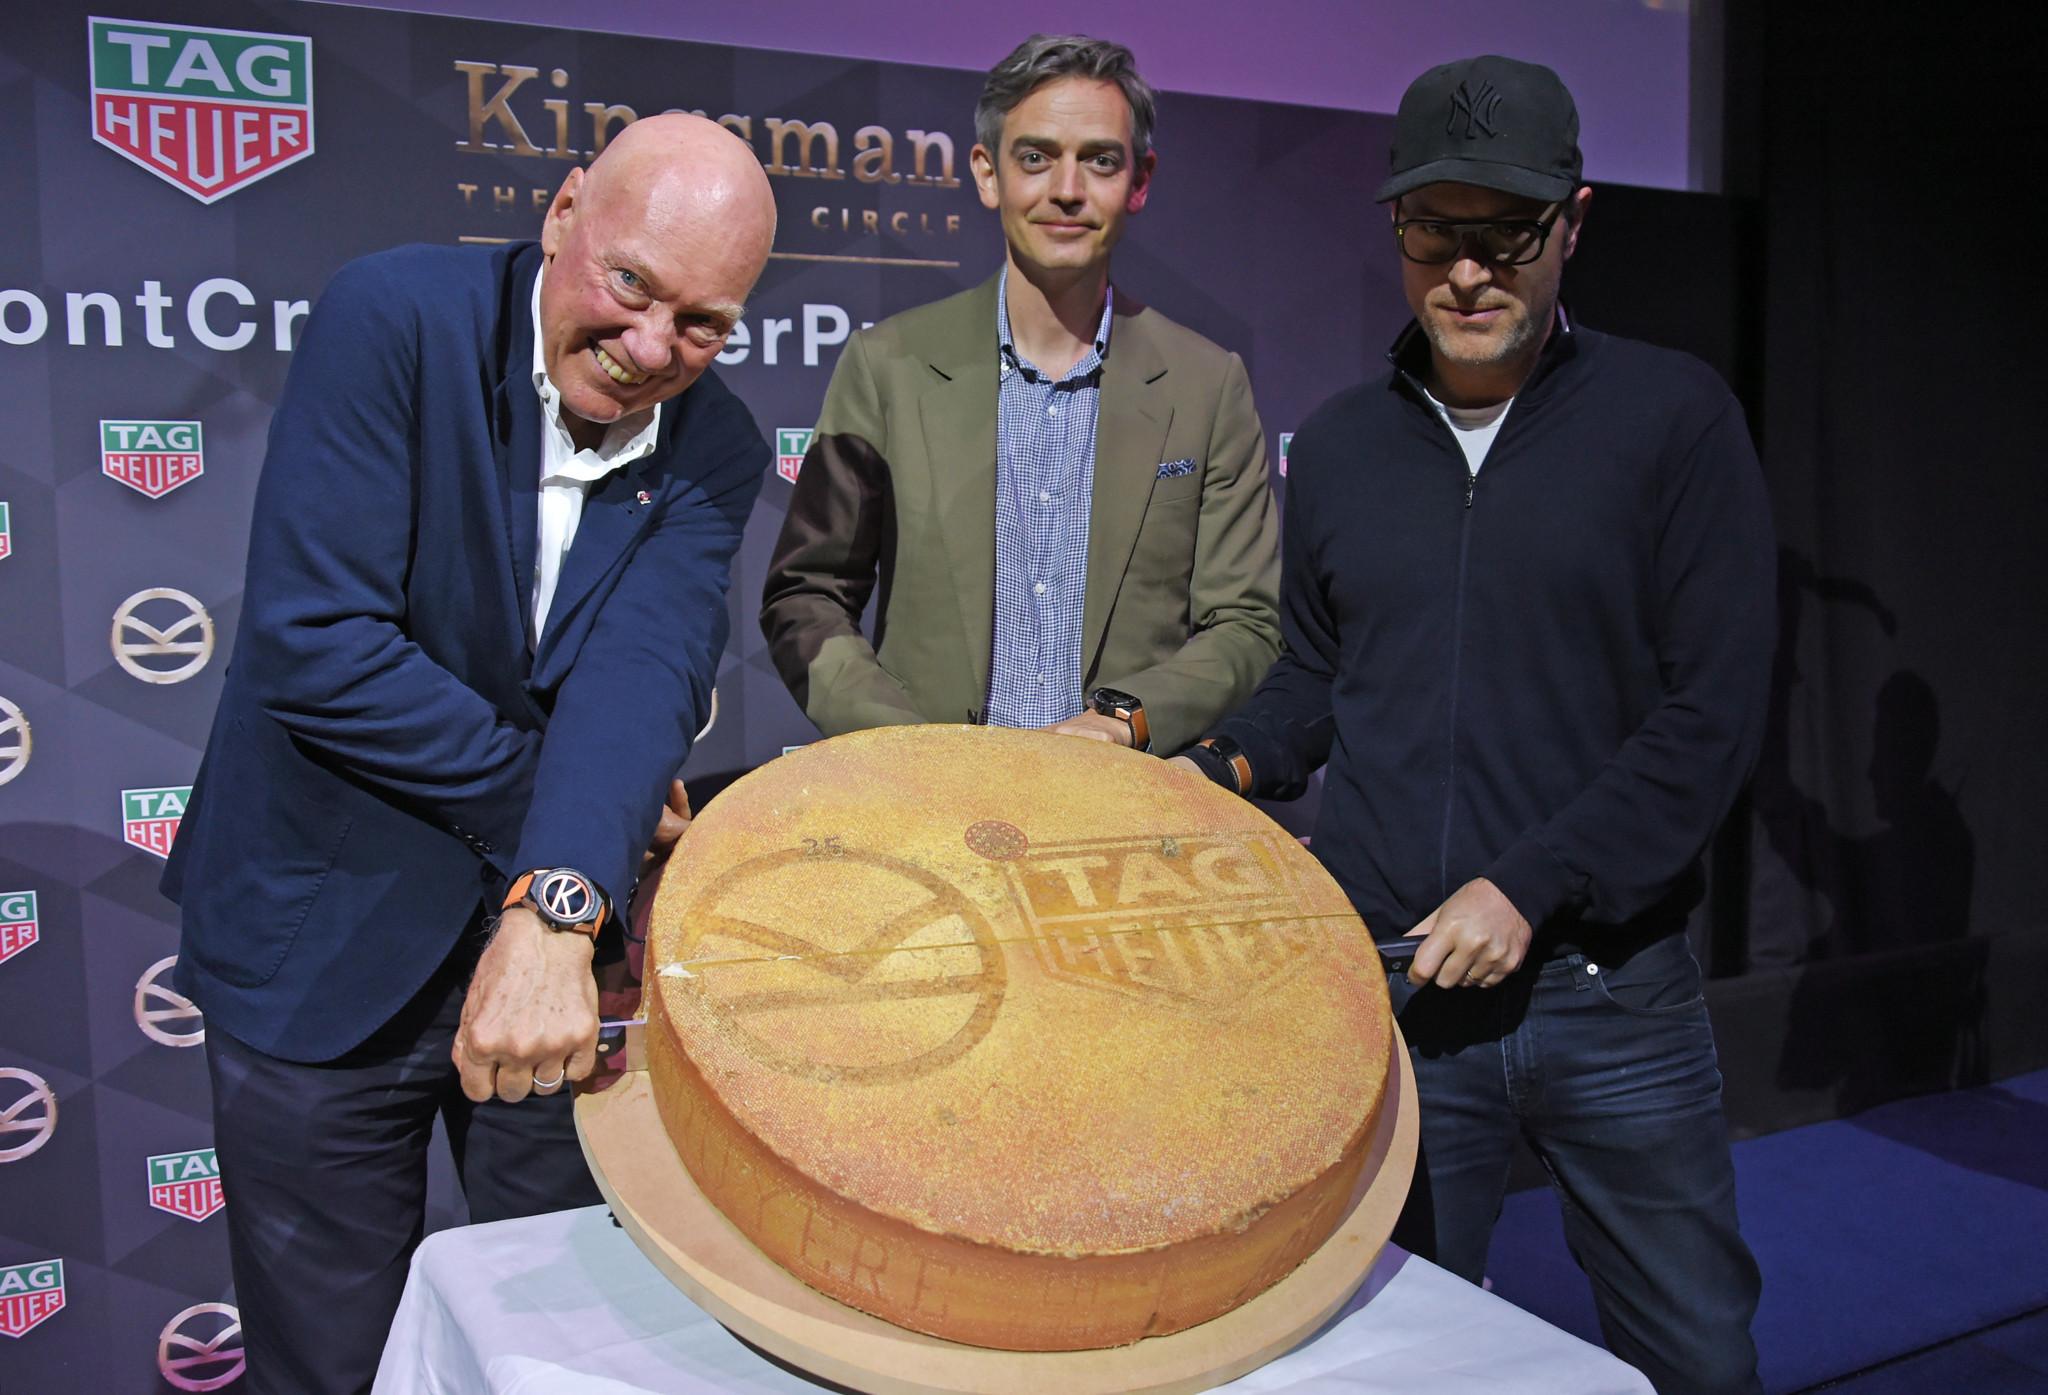 Jean-Claude Biver, Toby Bateman and